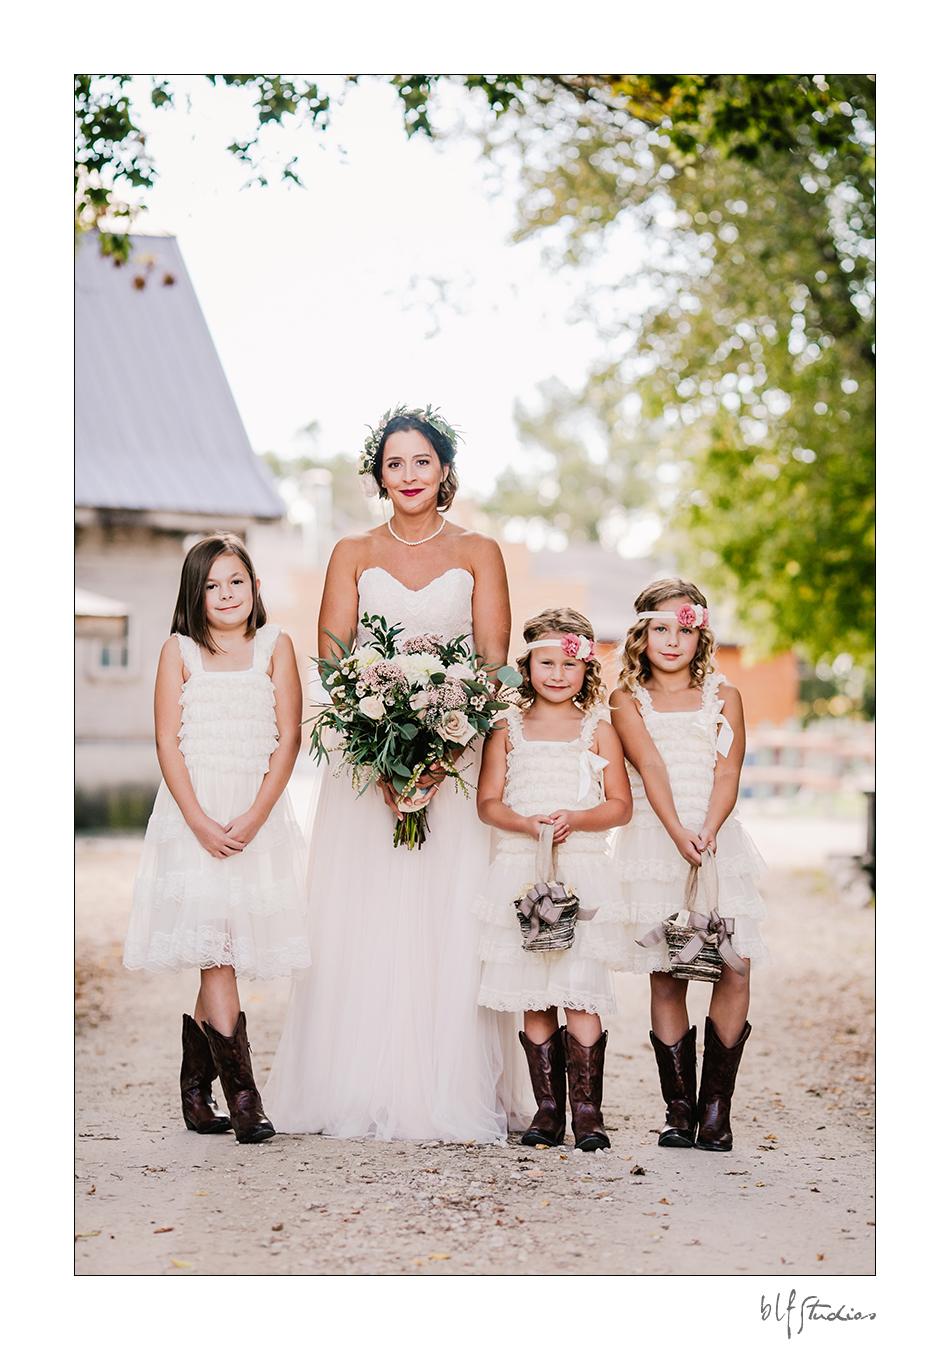 017-winnipeg-hitchnpost-wedding-marla-alana.jpg